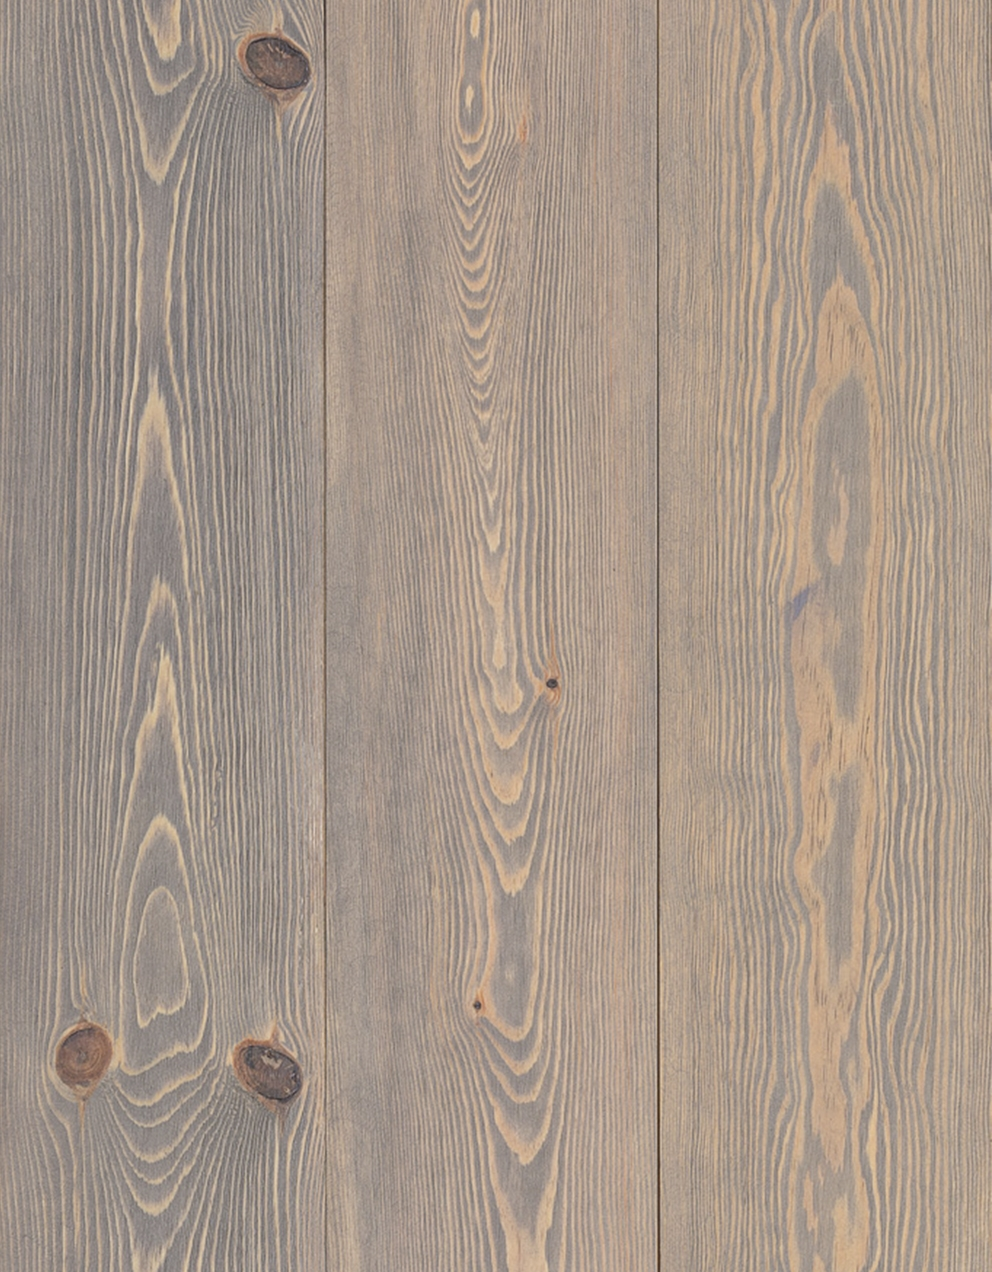 Tarima de madera gris Pino